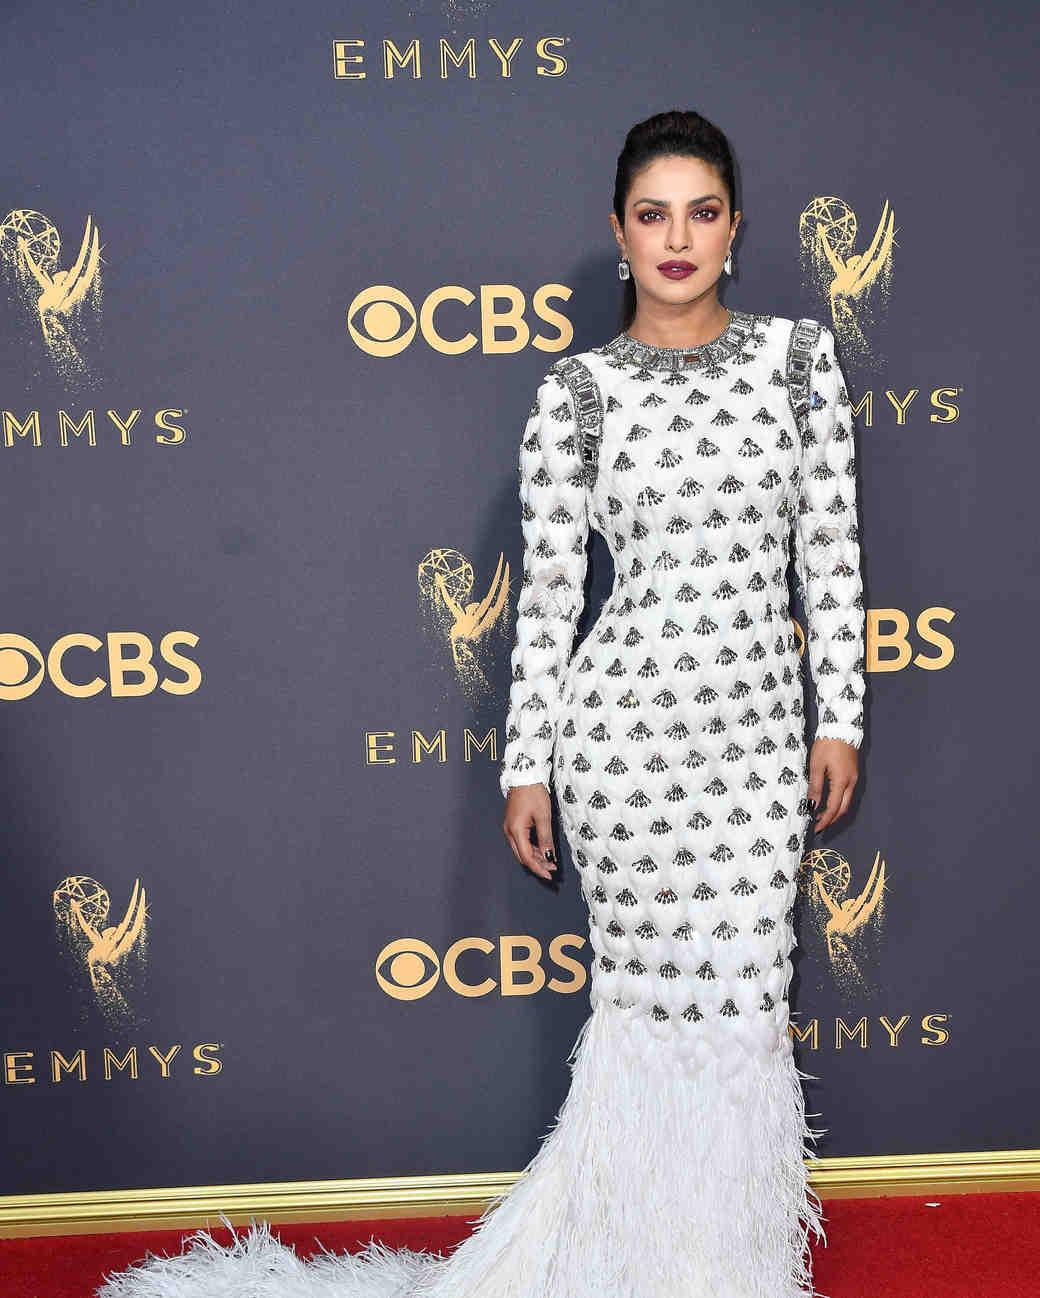 Priyanka Chopra Emmys Red Carpet 2017